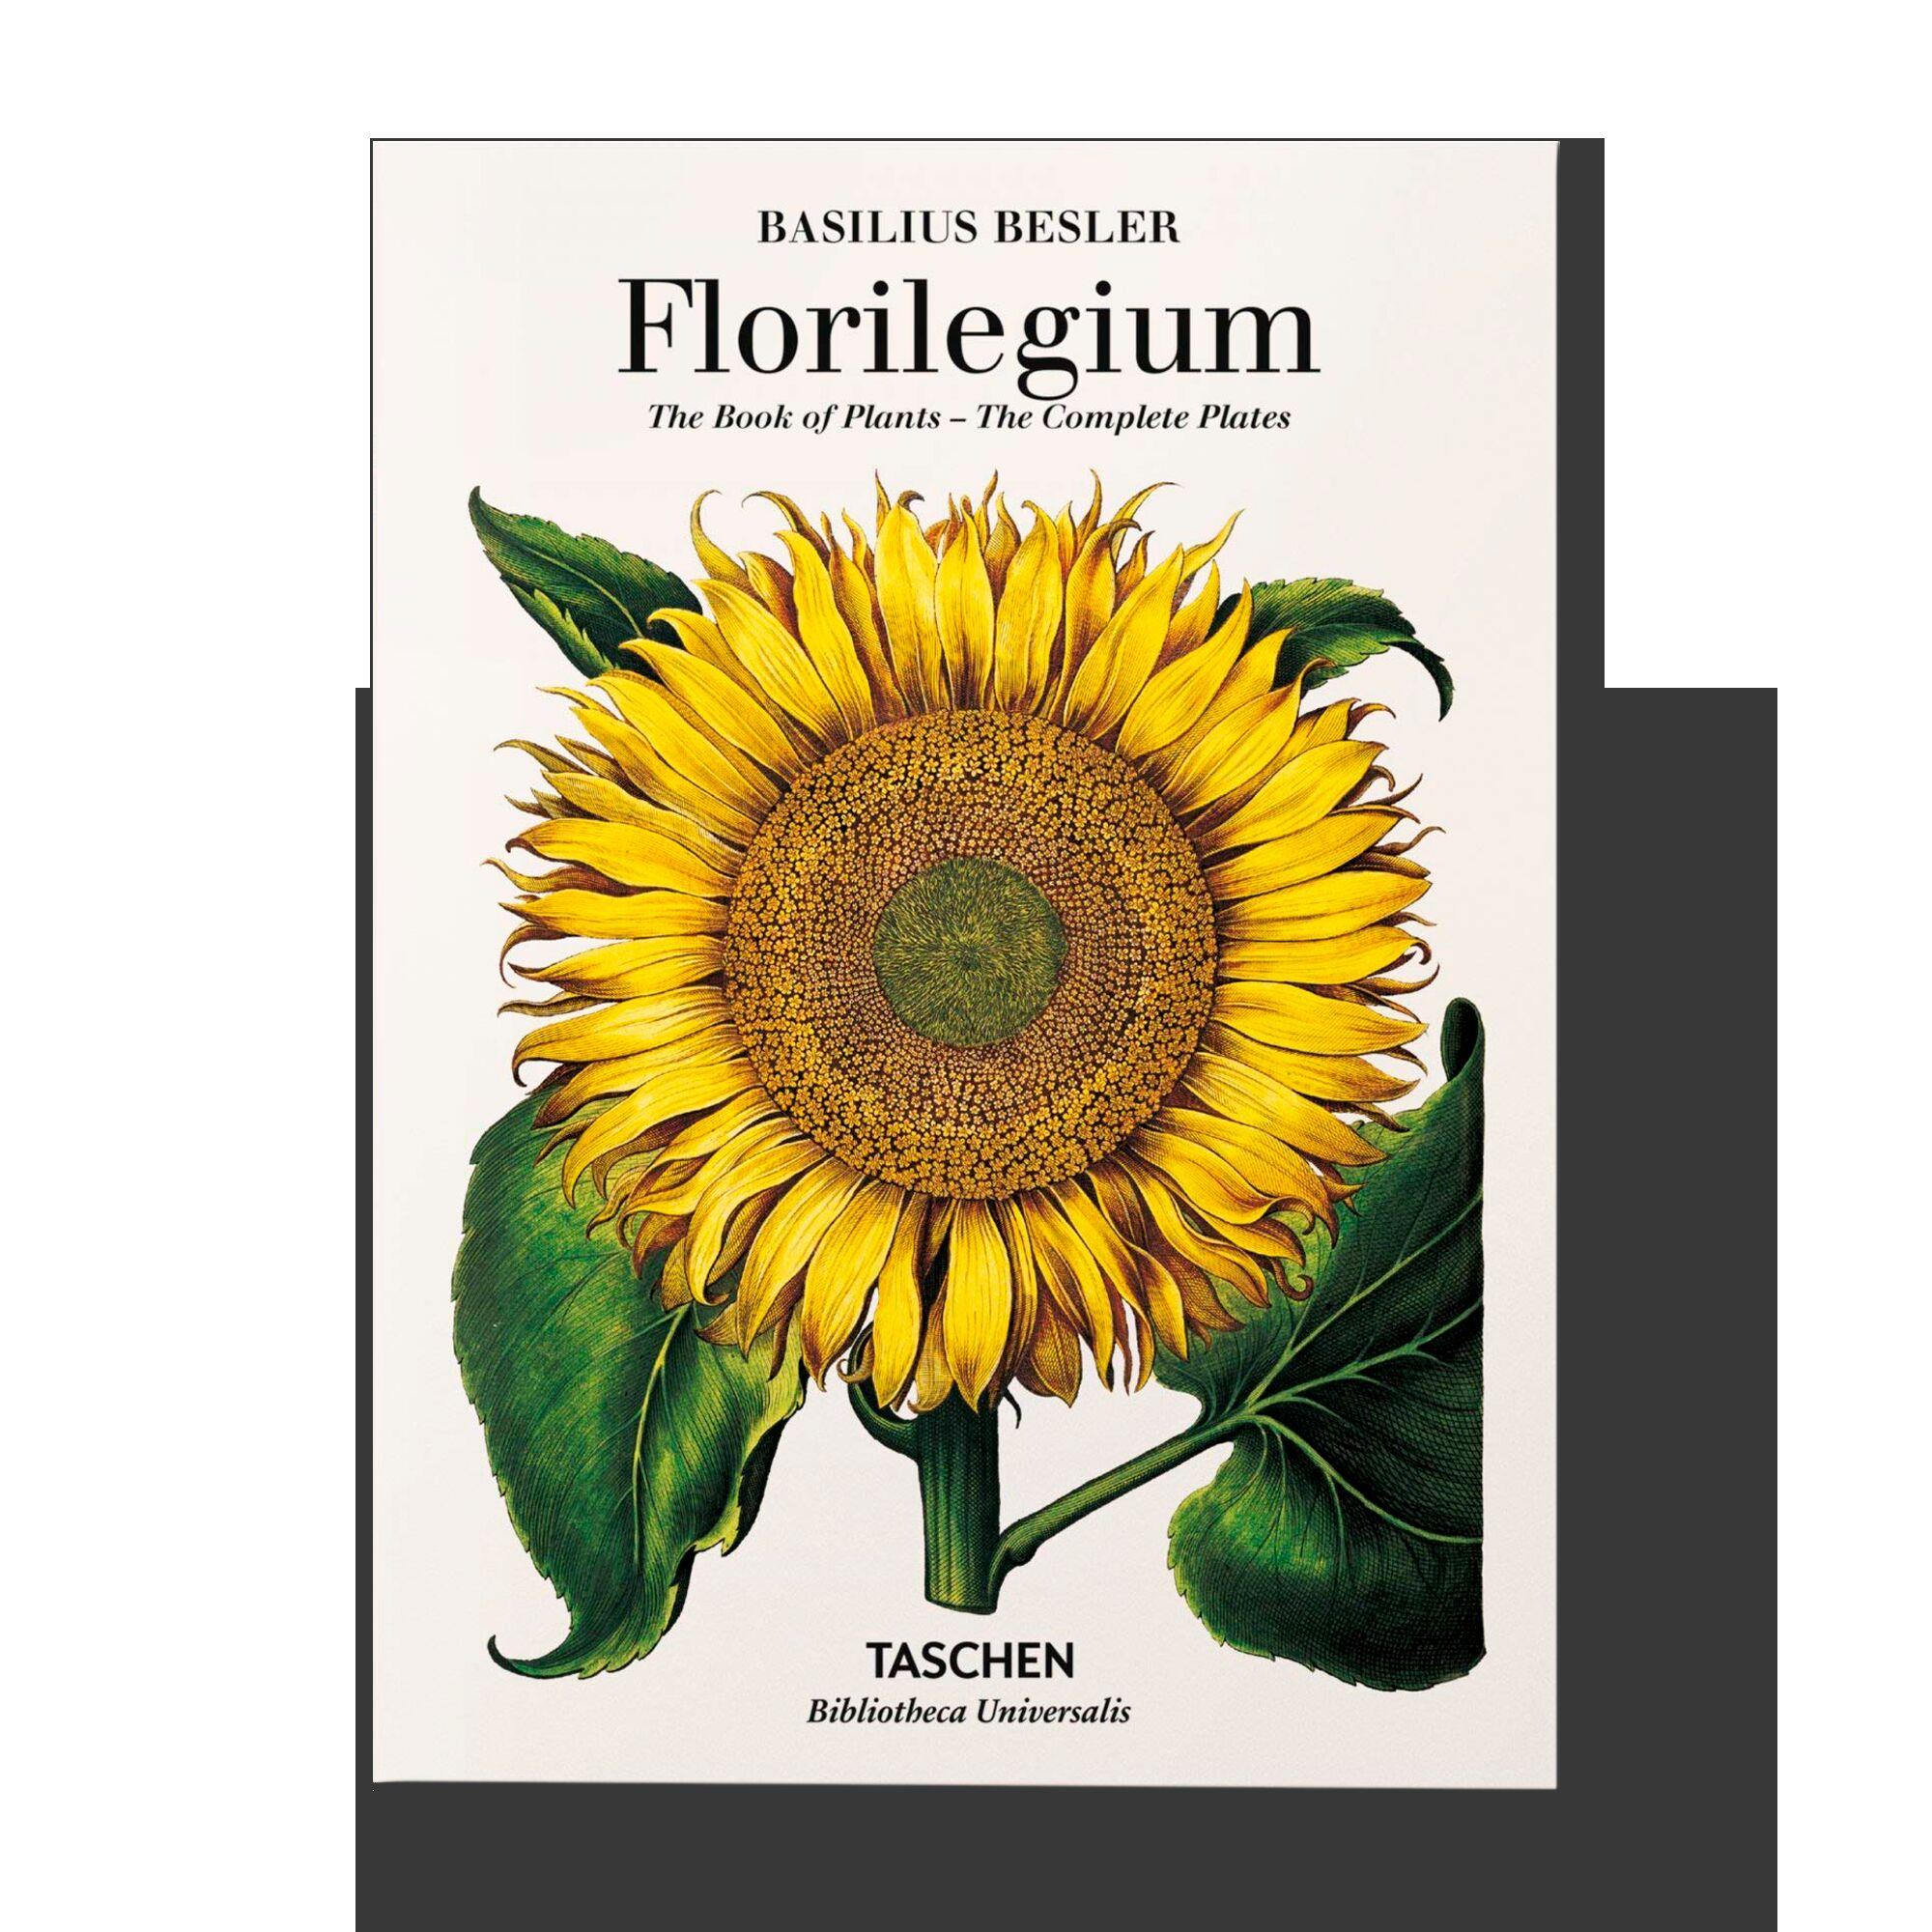 Basilius Besler's Florilegium: The Book of Plants (Bibliotheca Universalis)